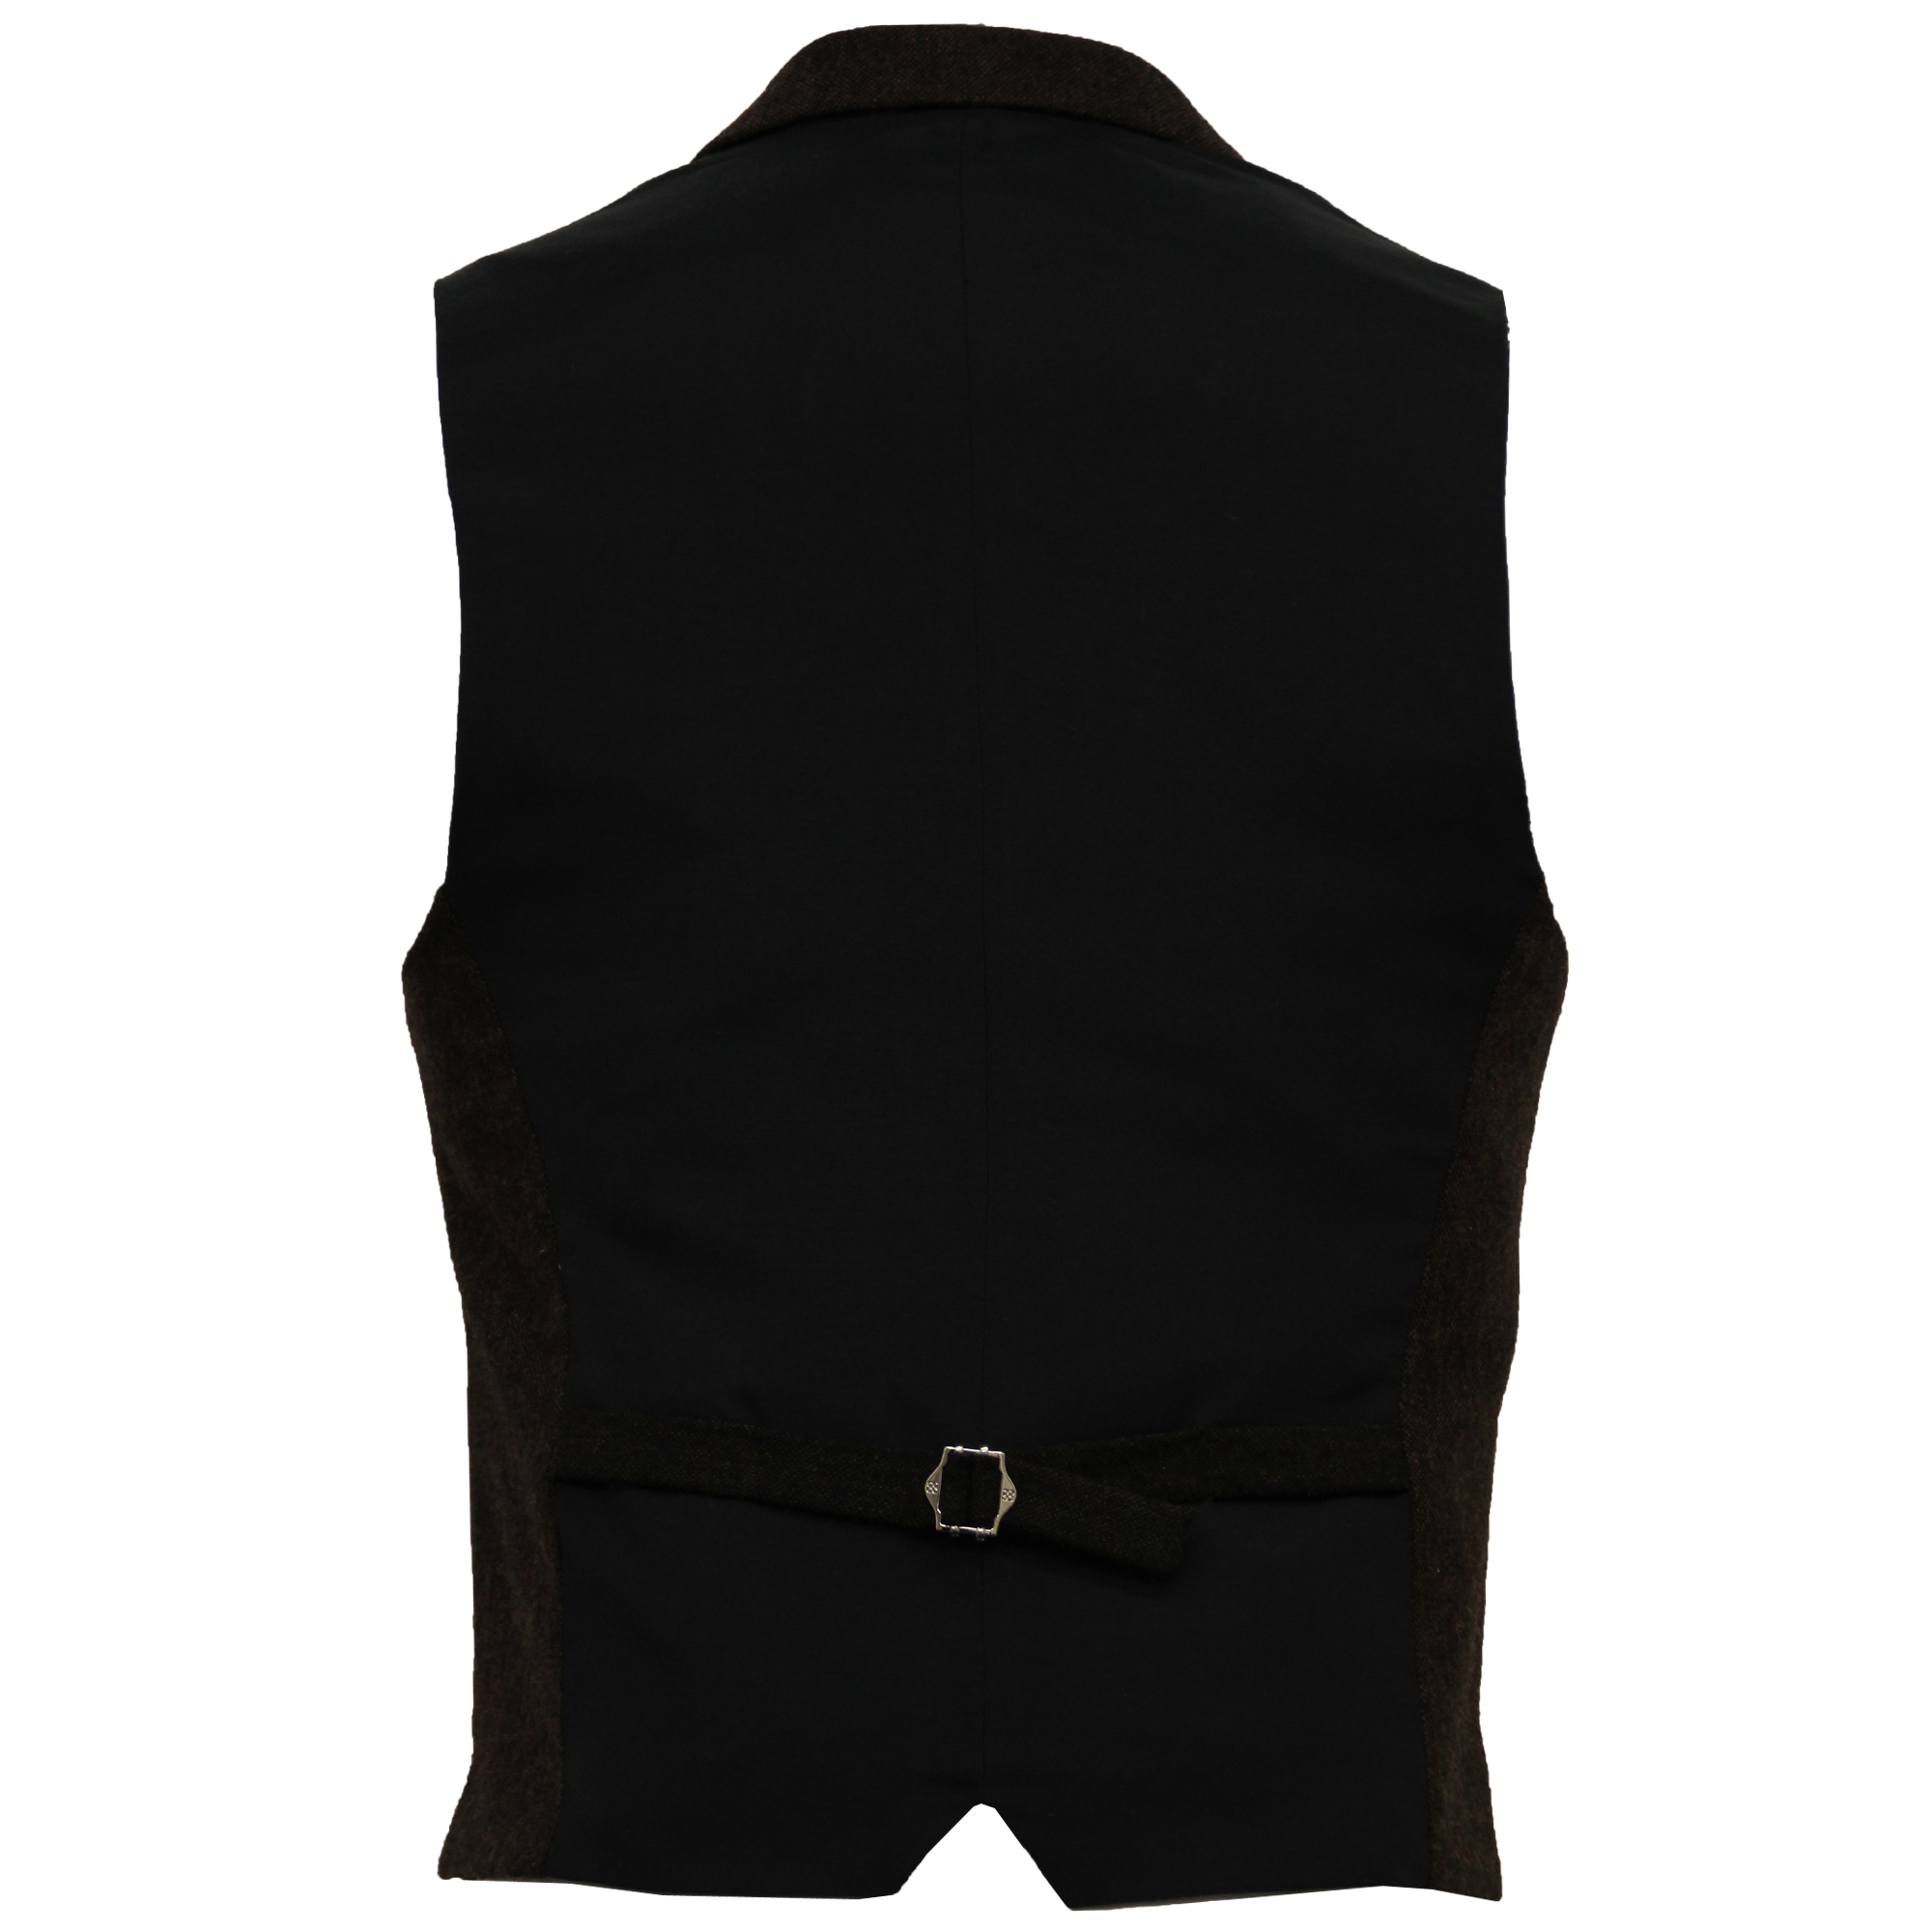 Mens-Waistcoat-Wool-Mix-Cavani-Formal-Vest-Herringbone-Tweed-Check-Party-Smart thumbnail 12